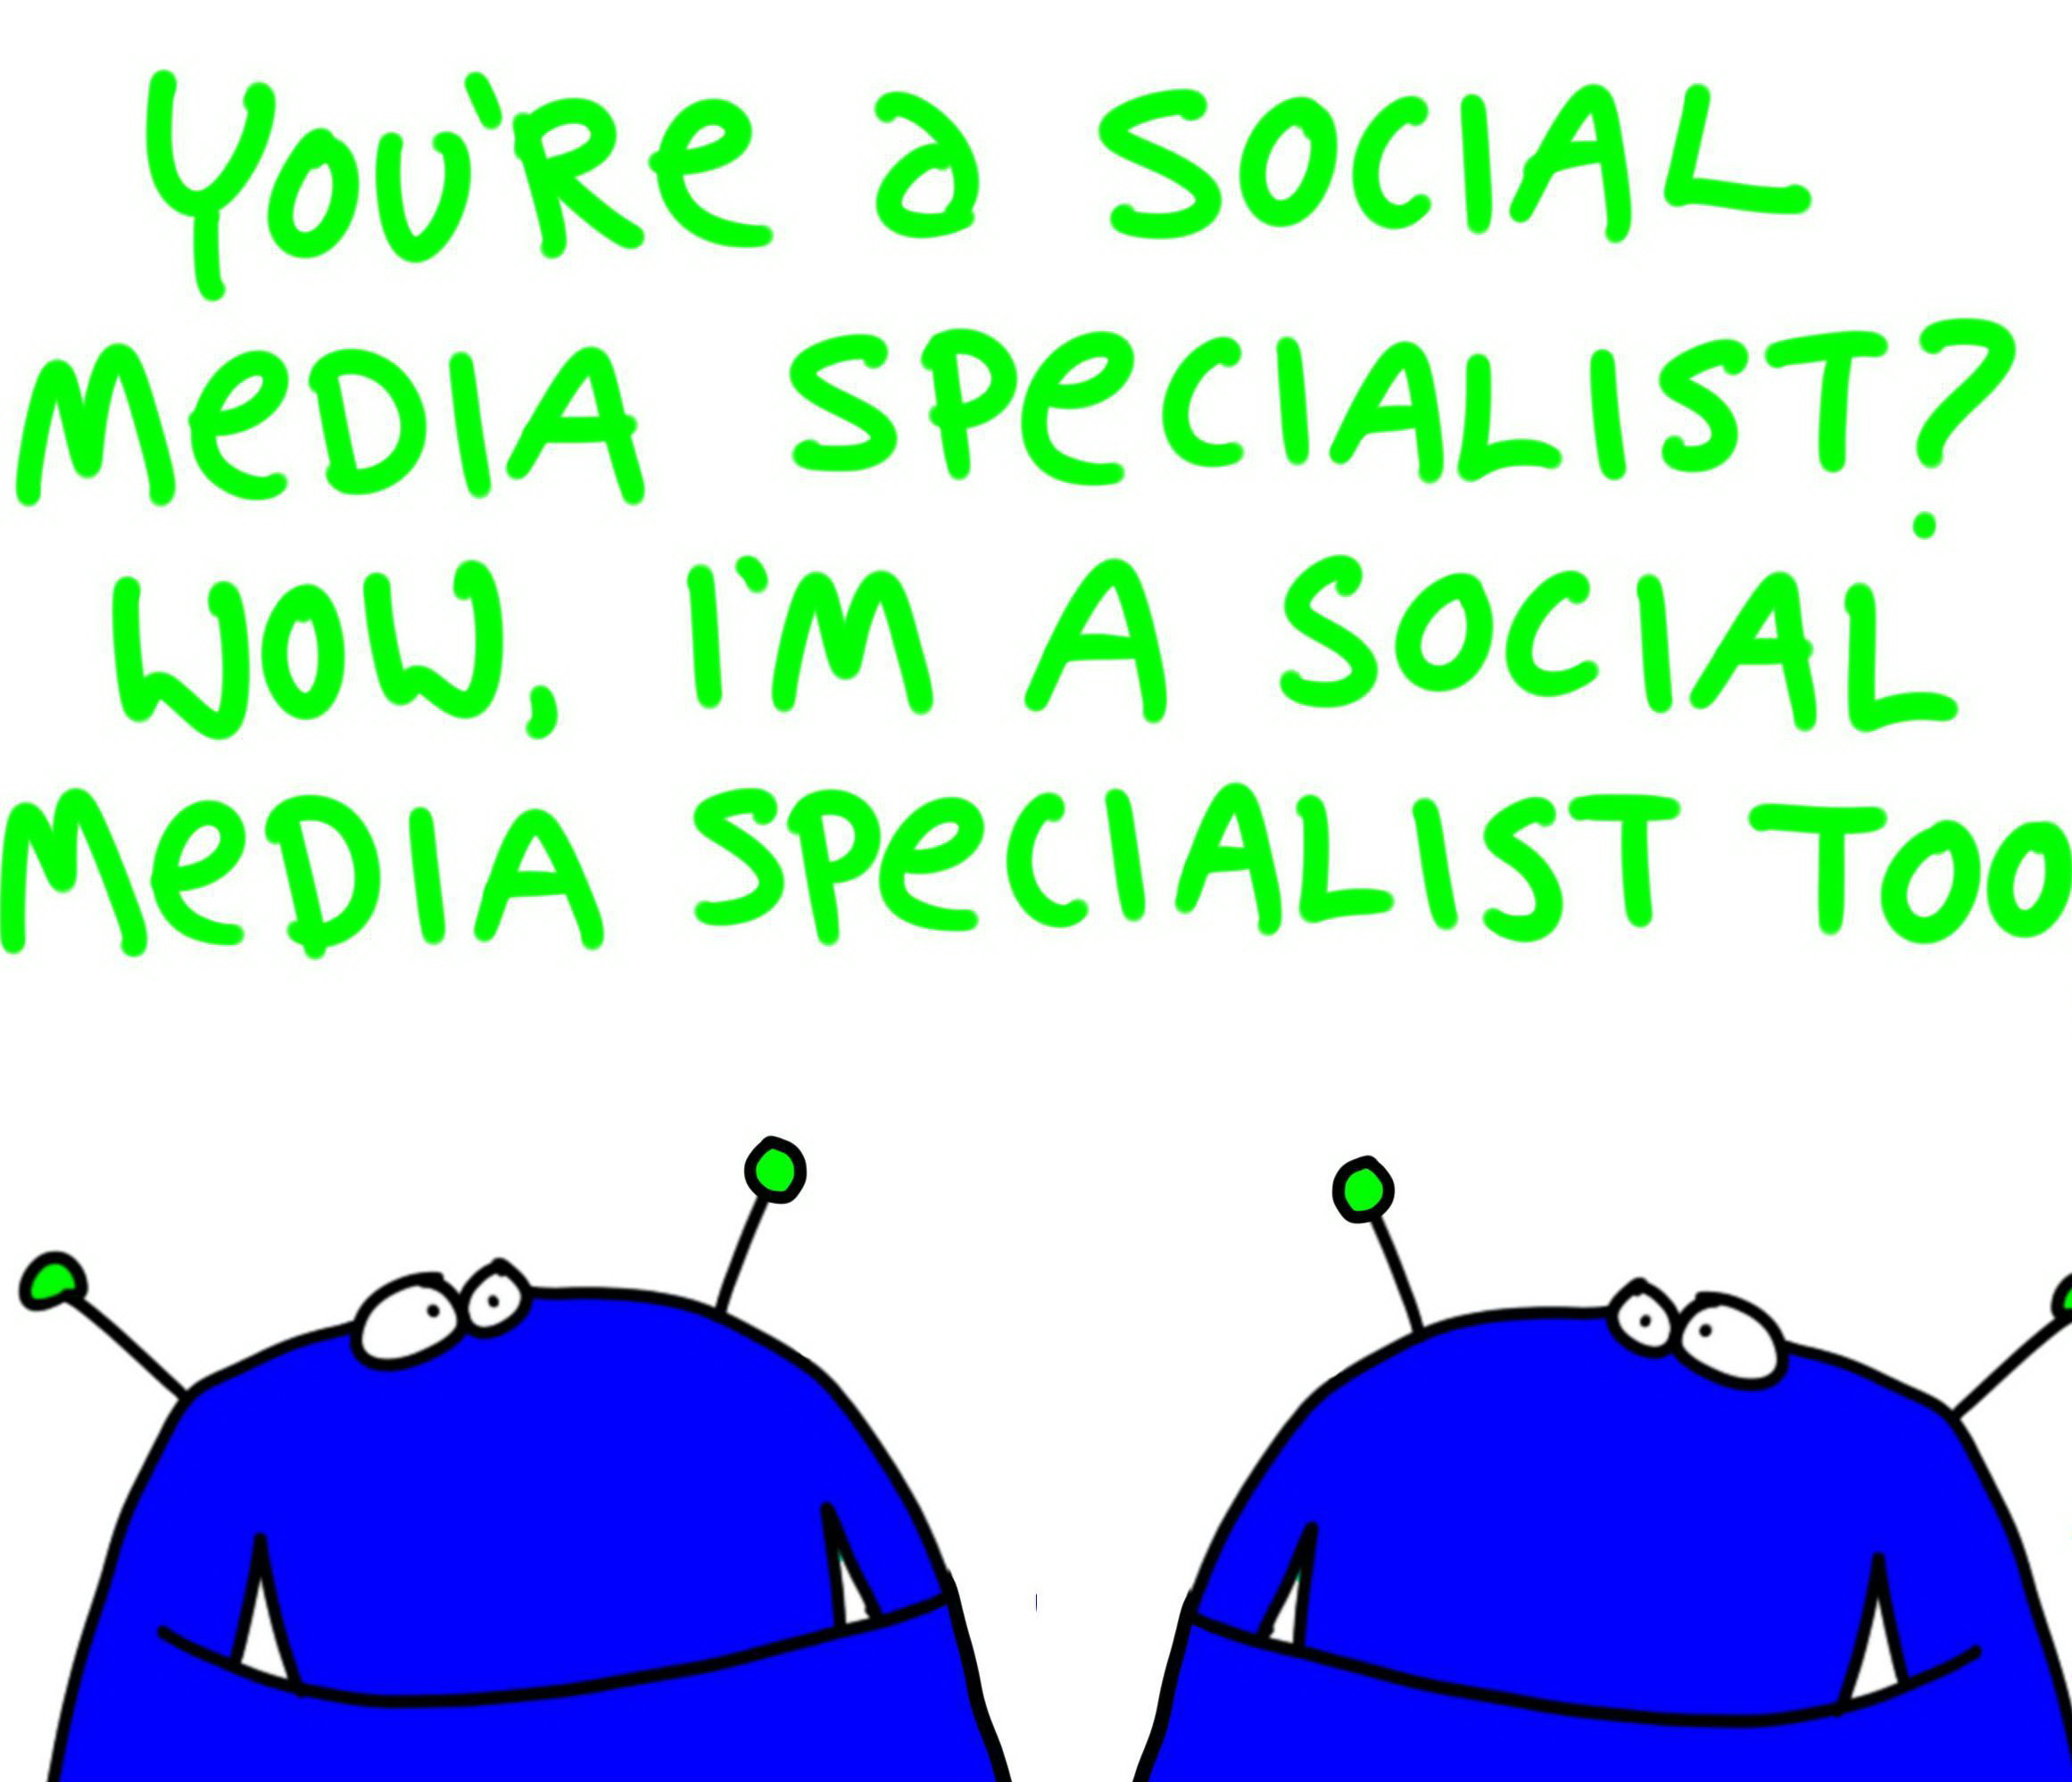 Cat de rentabil este sa lucrezi in social media